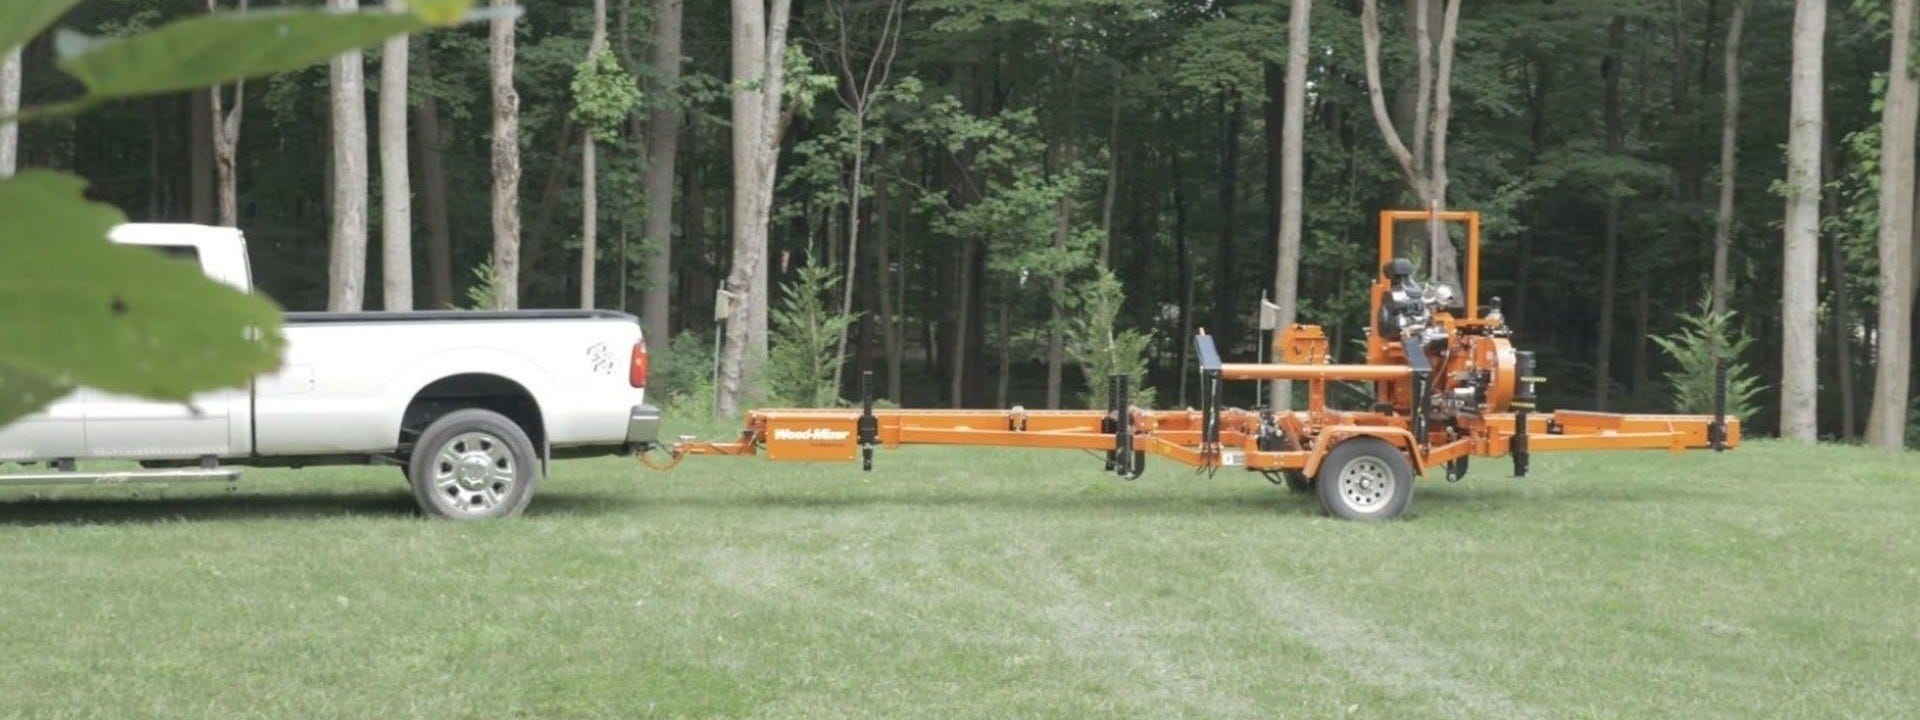 Wood-Mizer portable sawmill